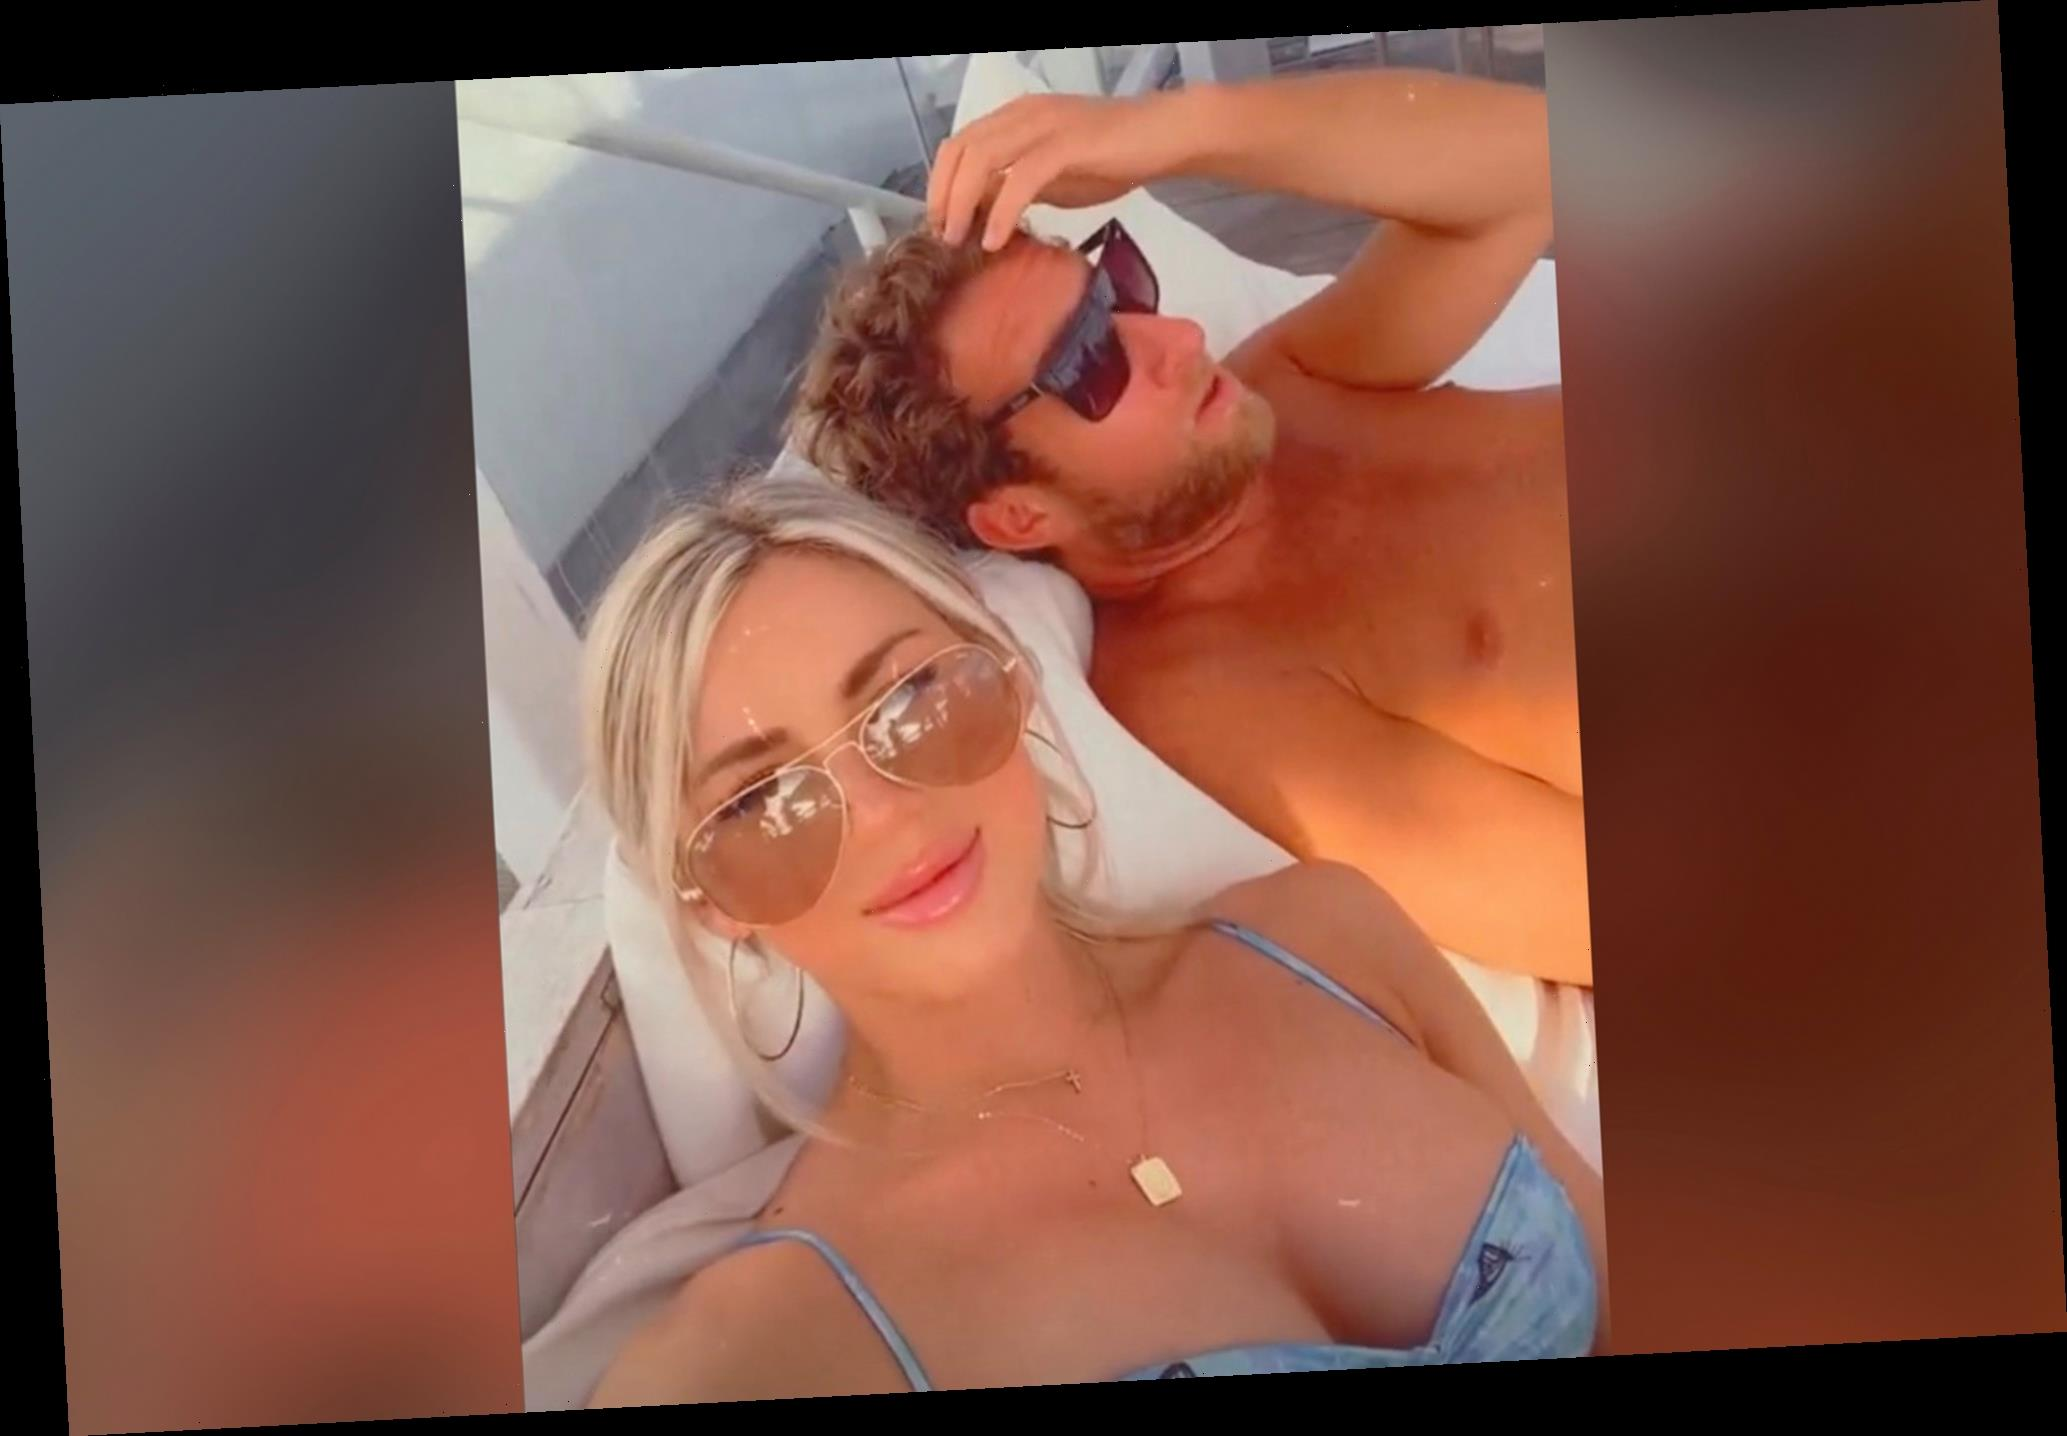 Barstool boss Dave Portnoy dating ex-cheerleader Shannon St. Clair